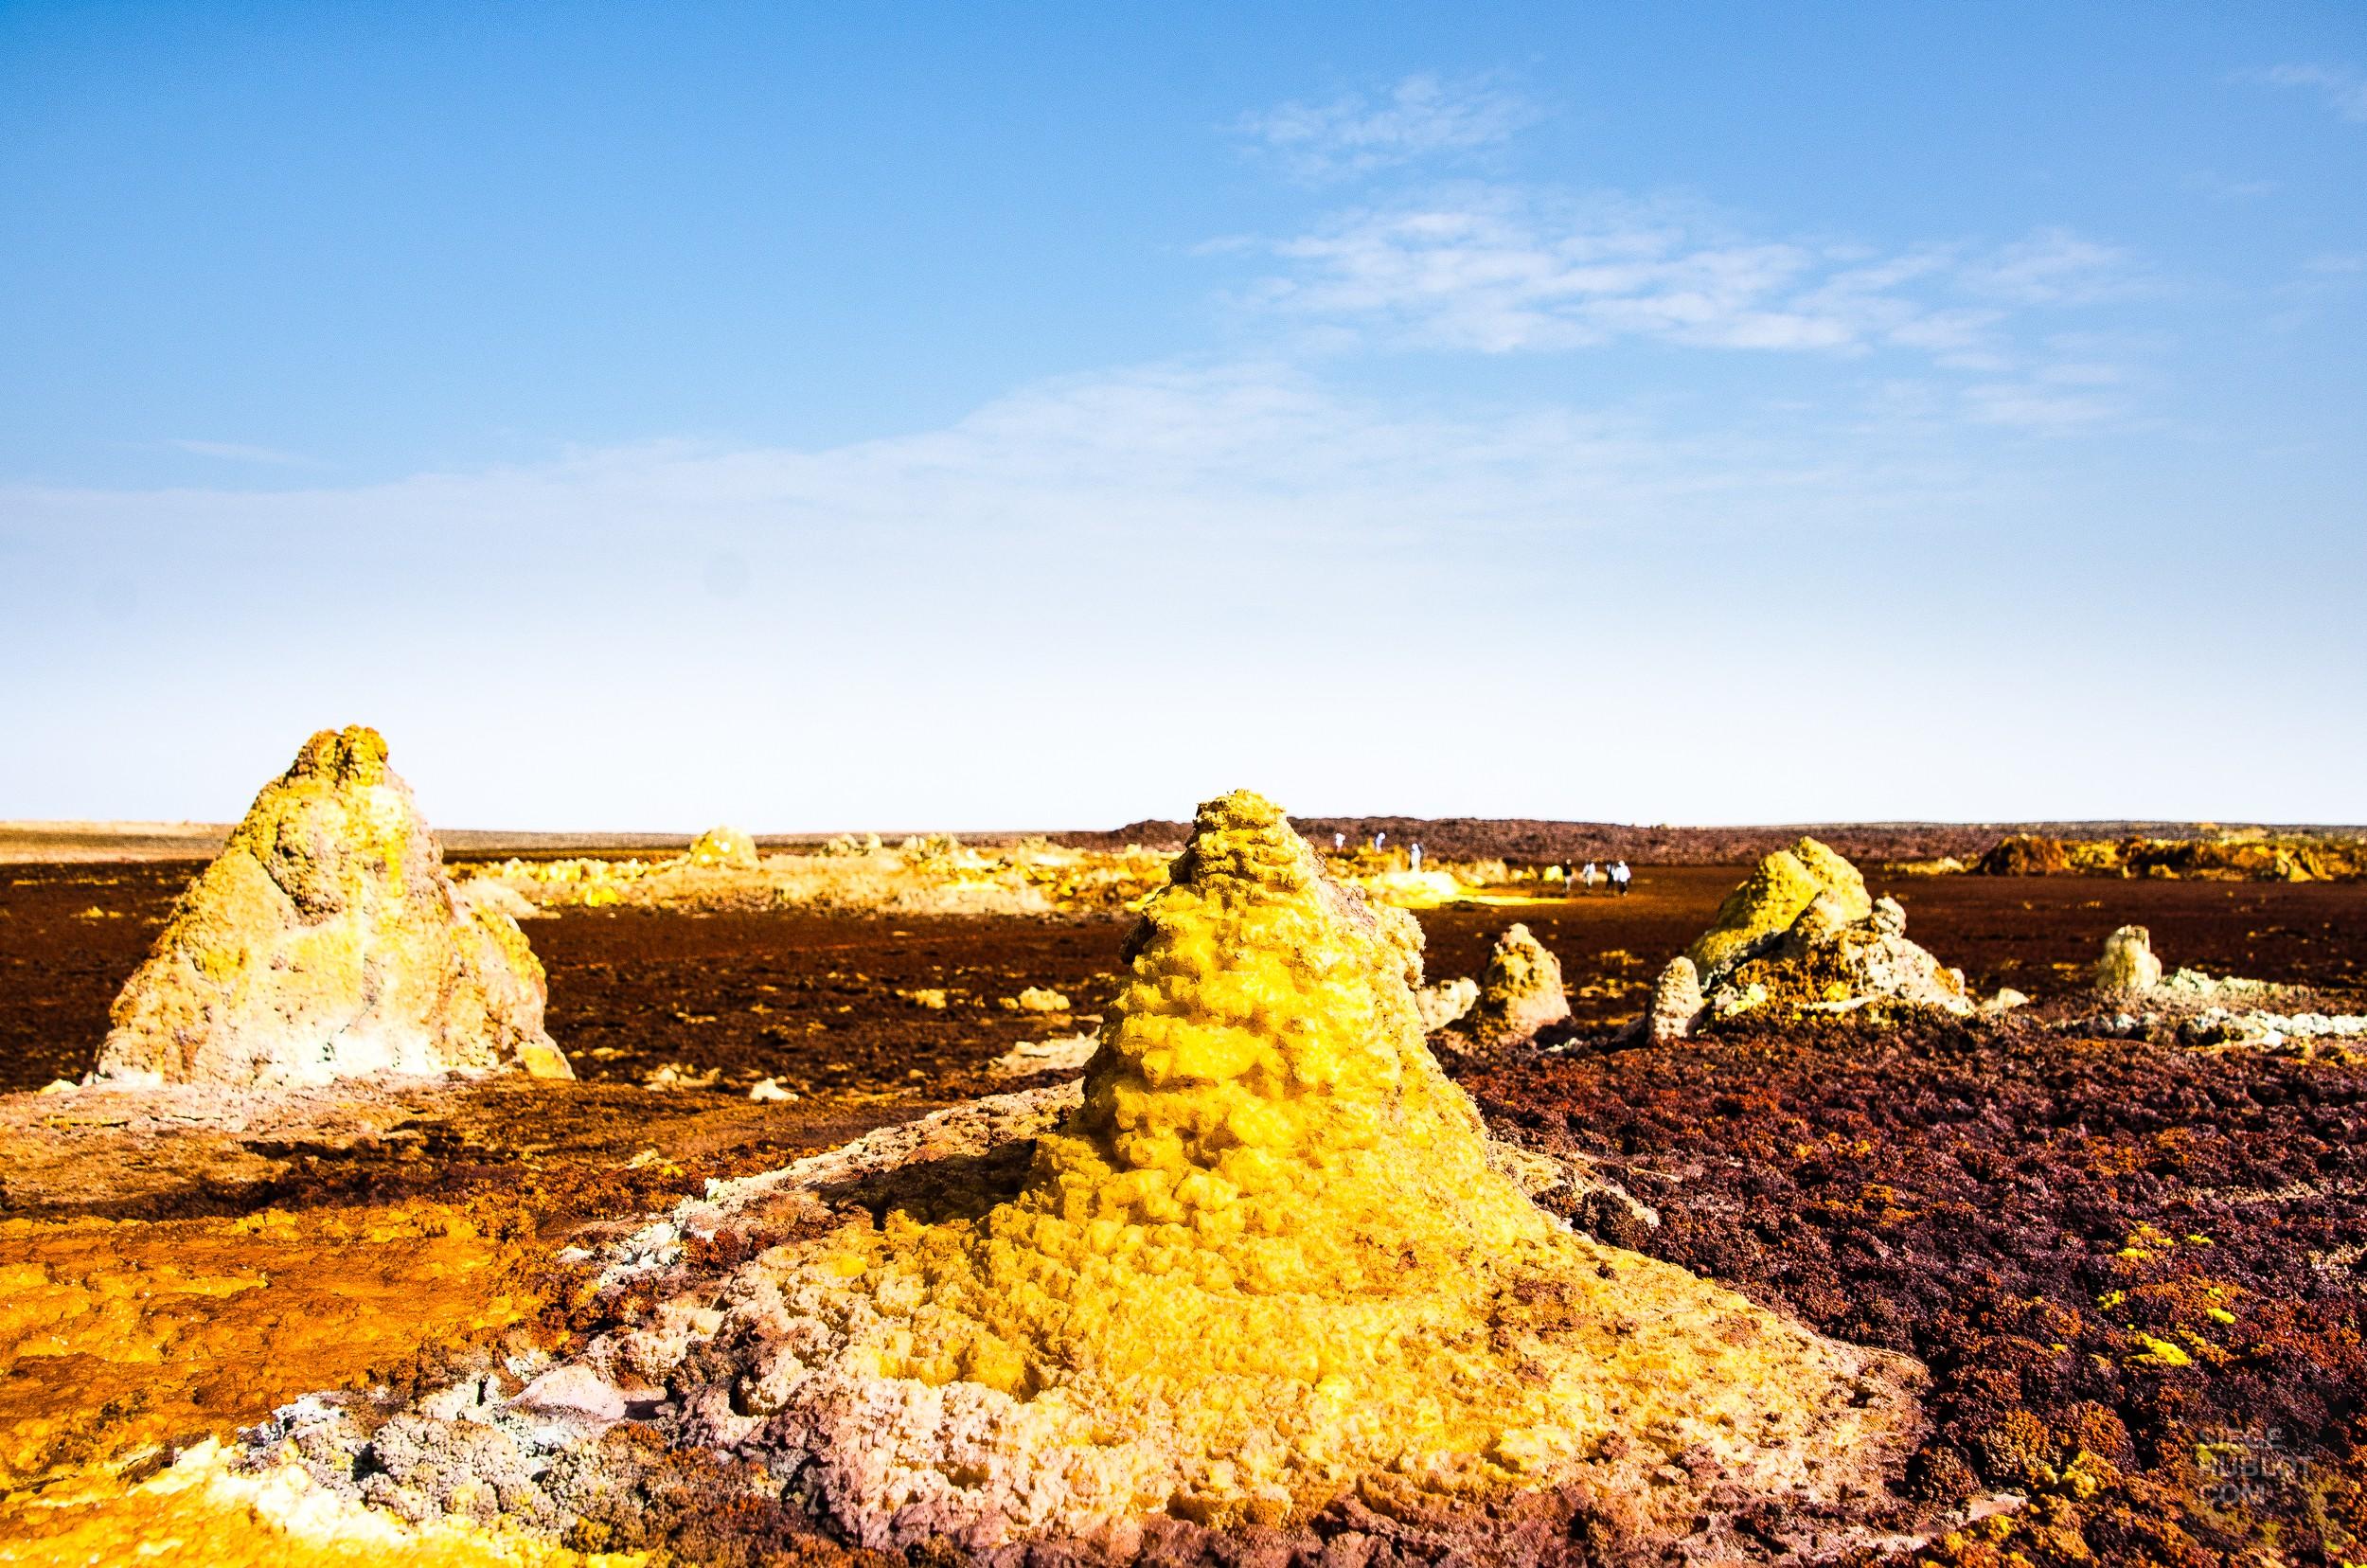 pinnacle mineraux - Dallol - Visiter une autre planete: Danakil, Ethiopie - afrique, ethiopie